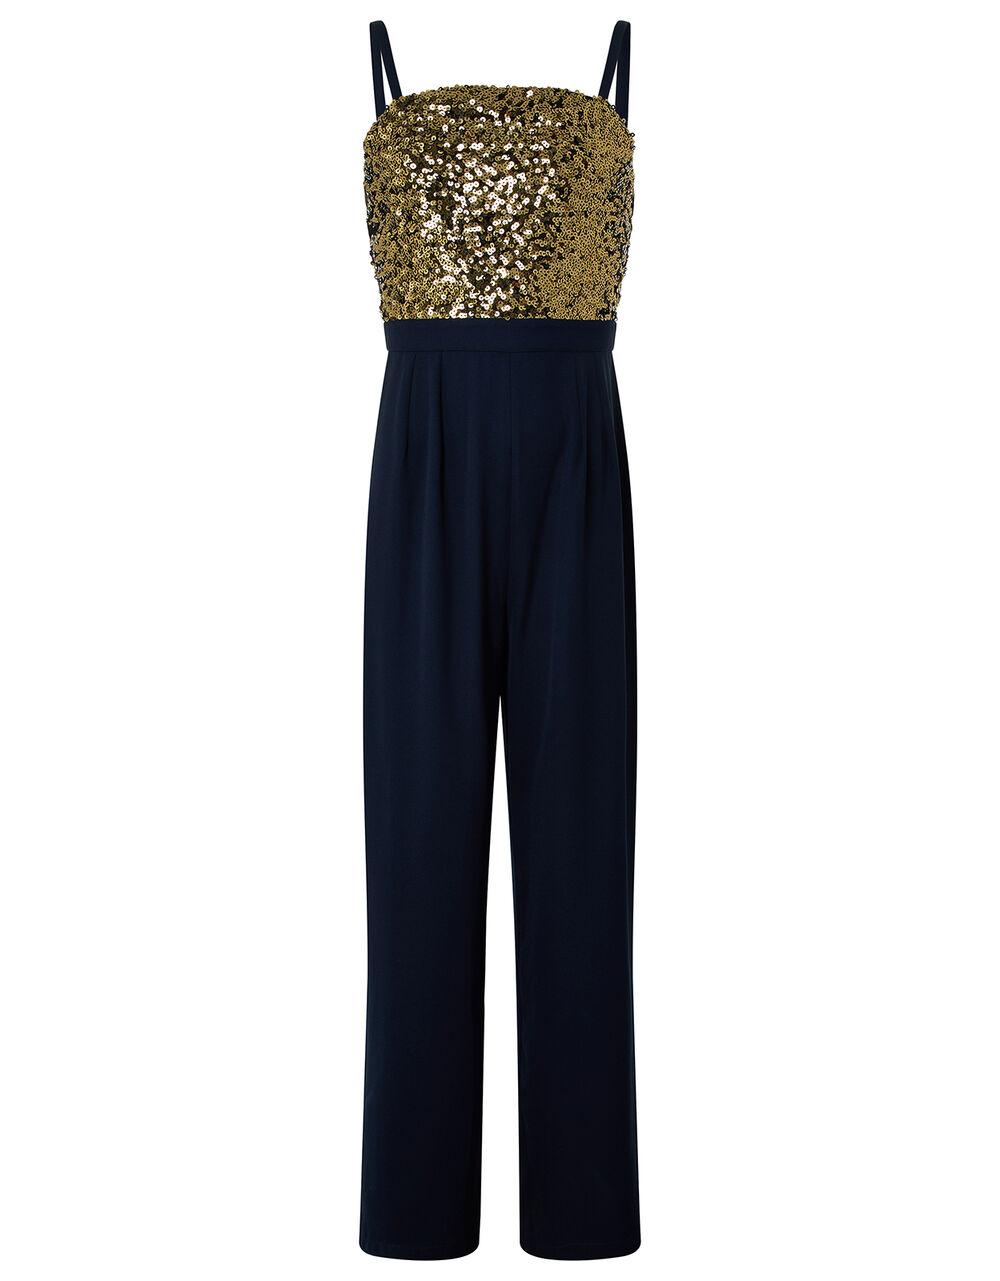 Betsy Sequin Wide-Leg Jumpsuit, Blue (NAVY), large